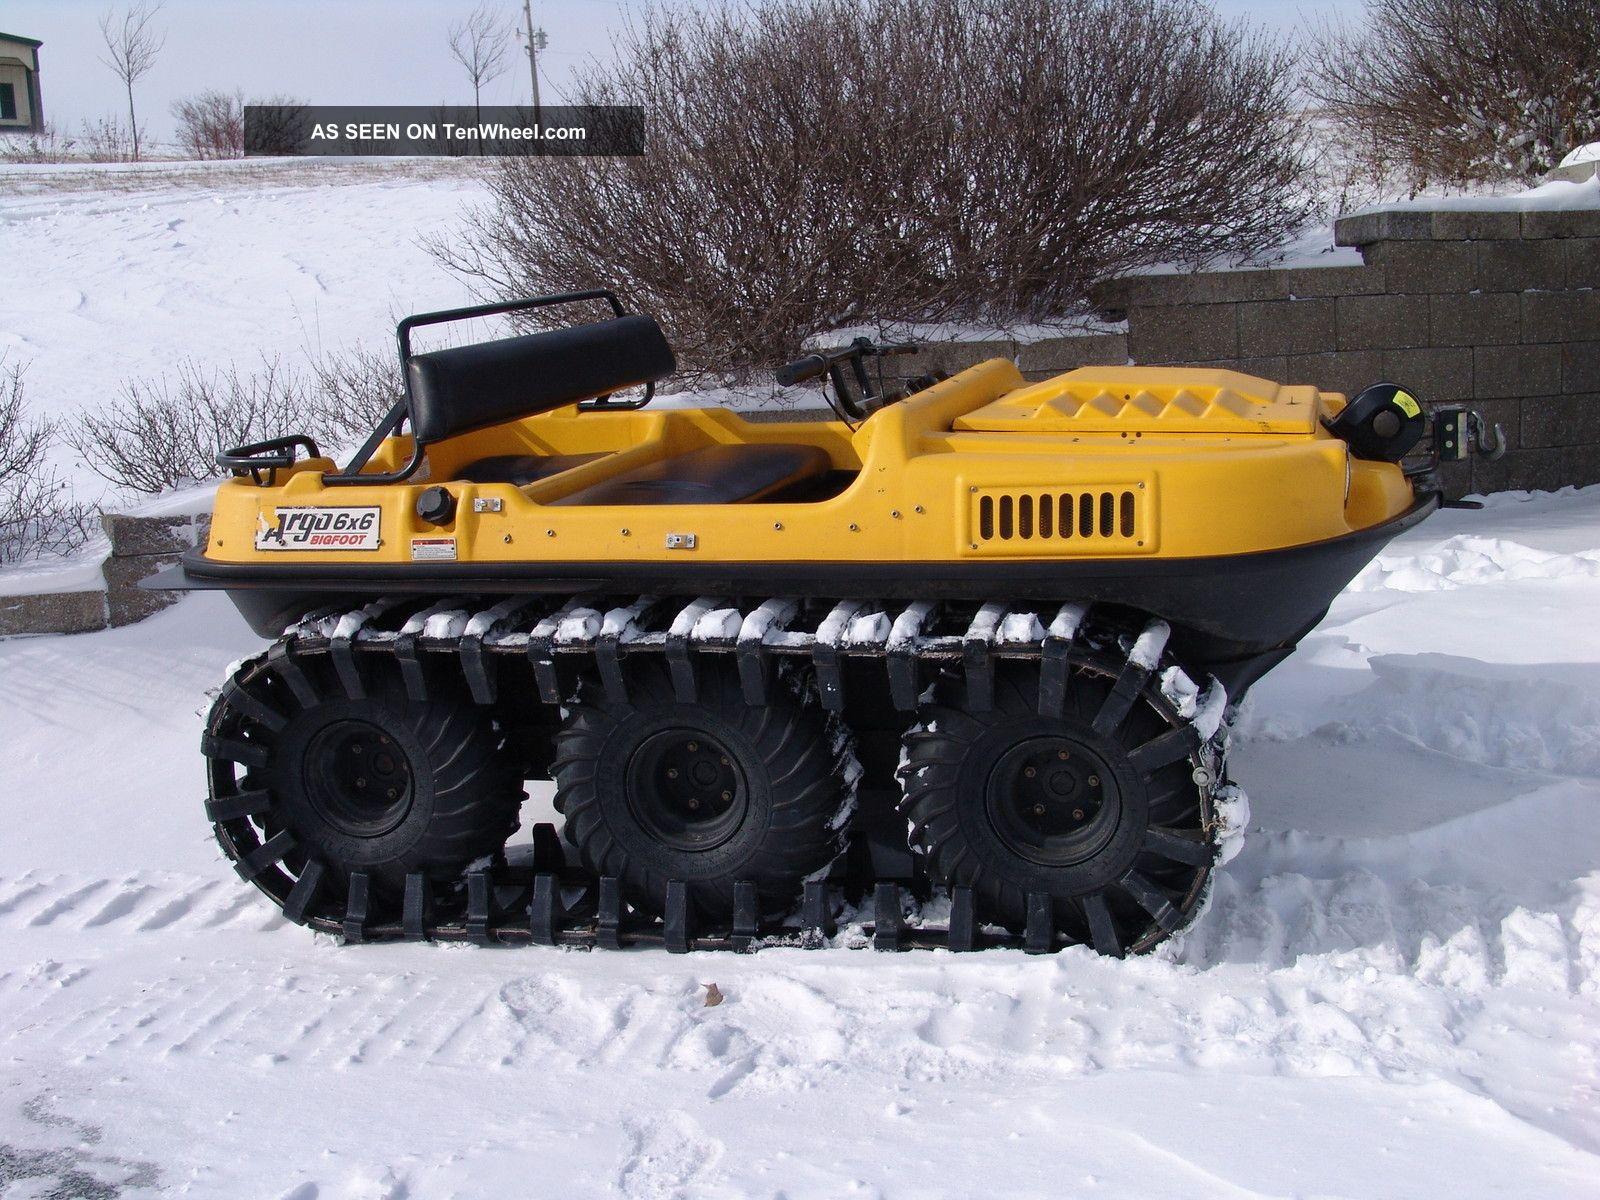 Argo Bigfoot 6x6 Amphibious Atv With Extended Snow Tracks Type